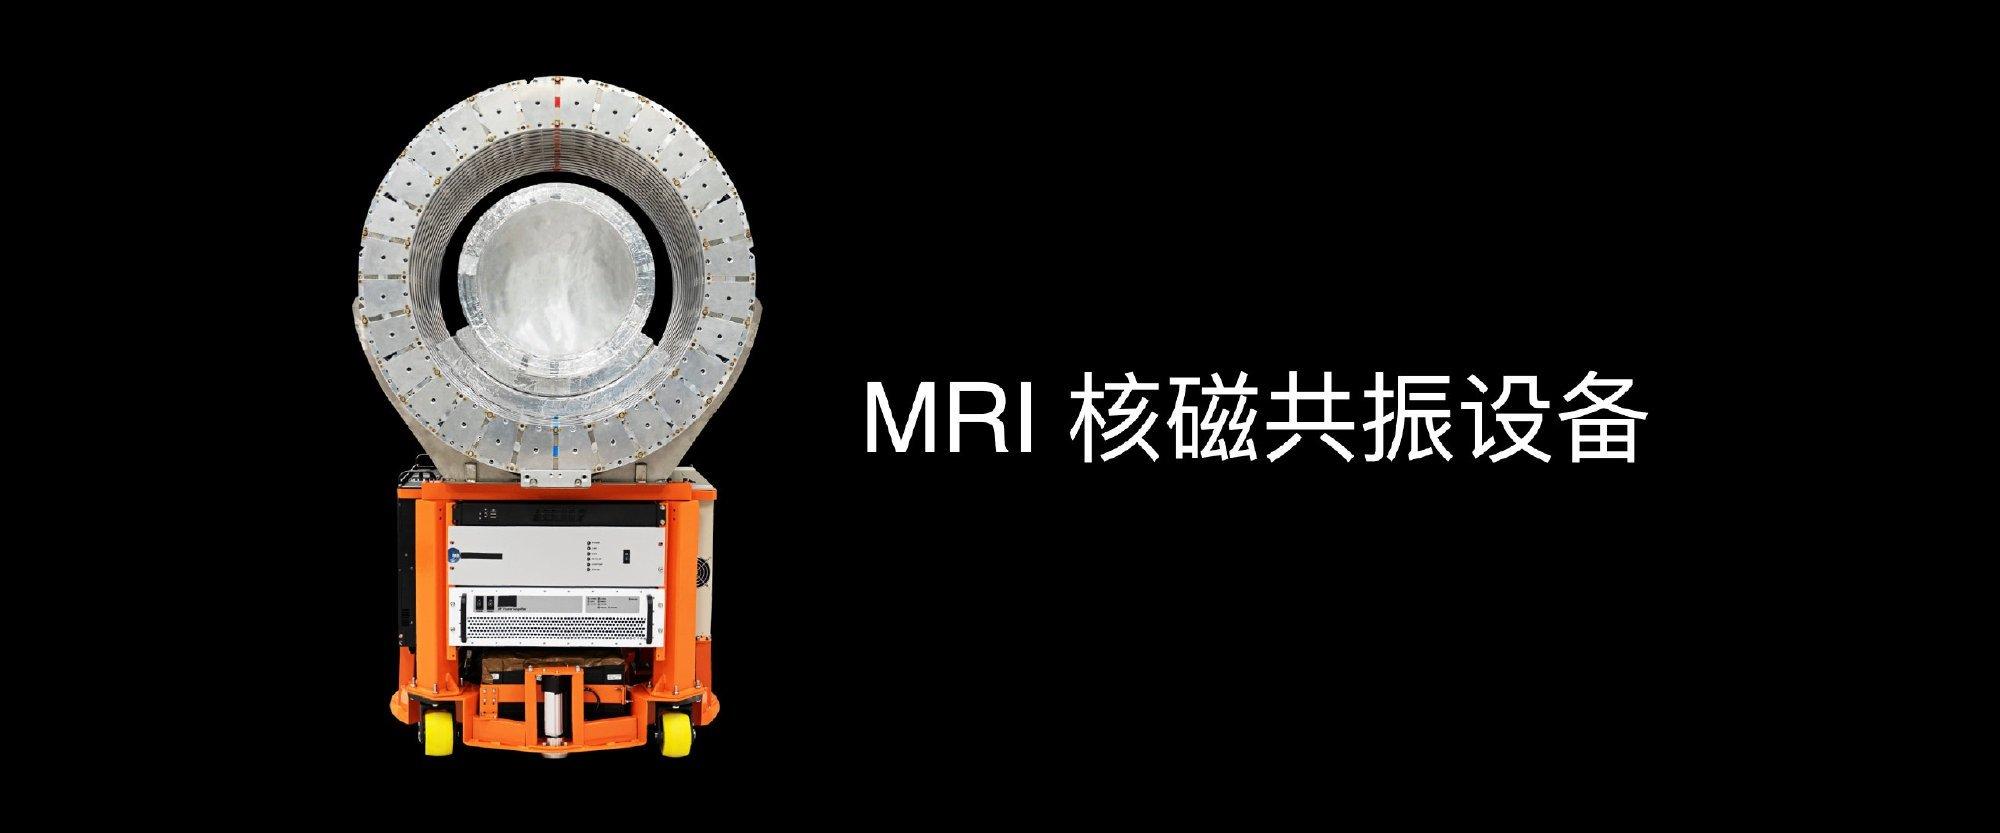 Obrazek przedstawia skaner MRI od Huami.